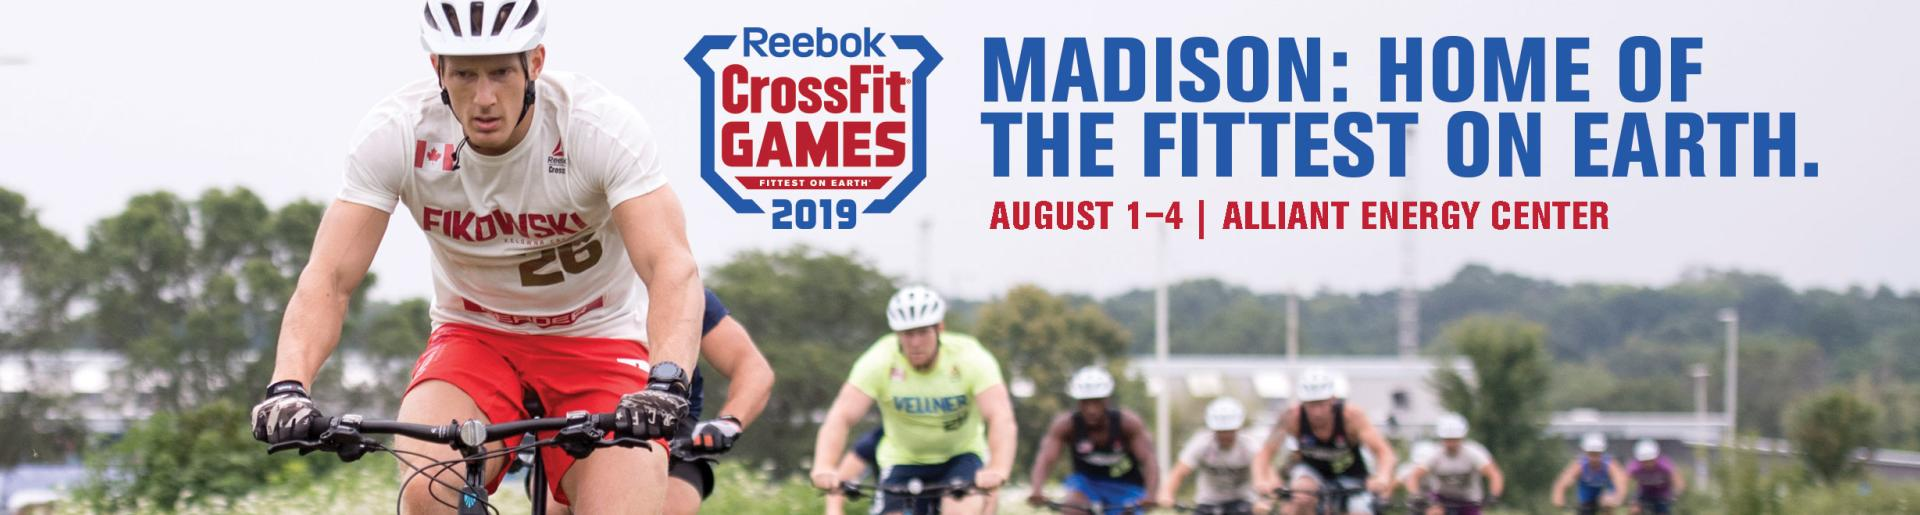 CrossFit 2019